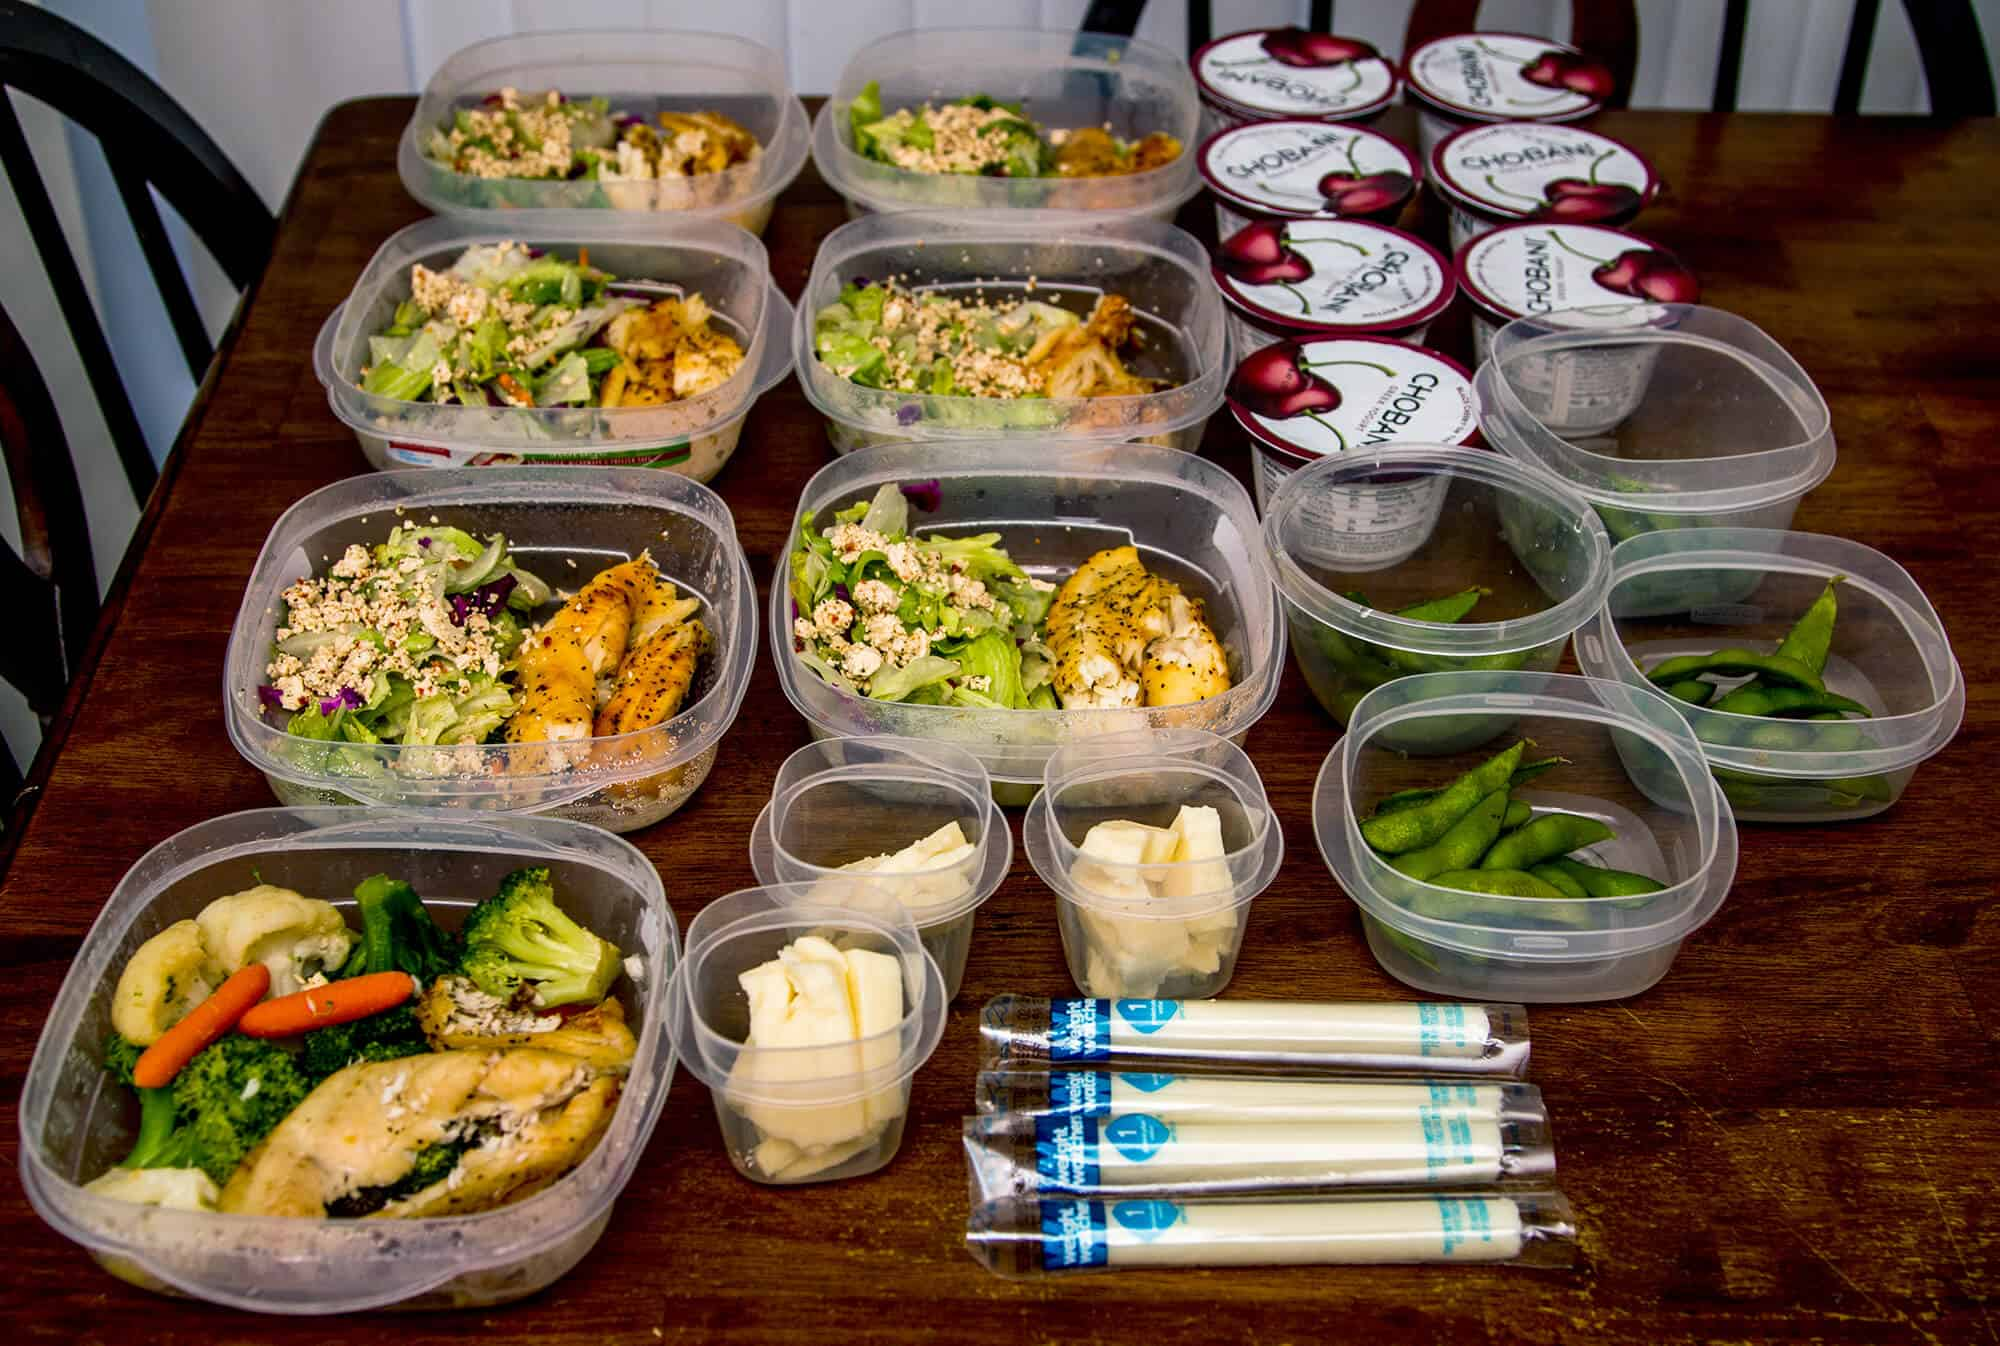 Best Readymade Kids' Meals